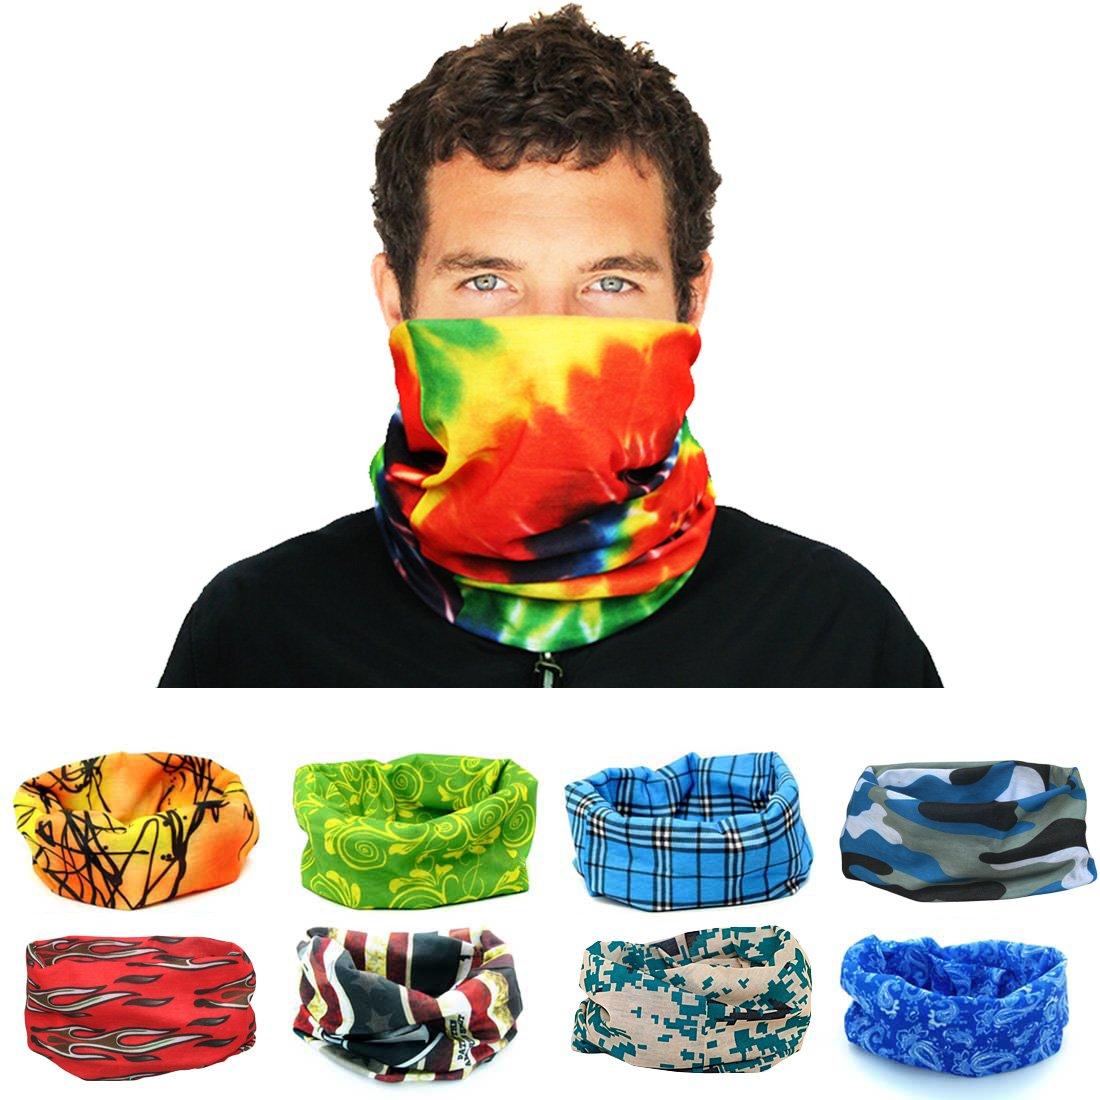 kilofly Multi-purpose Seamless Headwear Bandanas Mixed Set Value Pack [Set of 8] AHH405set8B